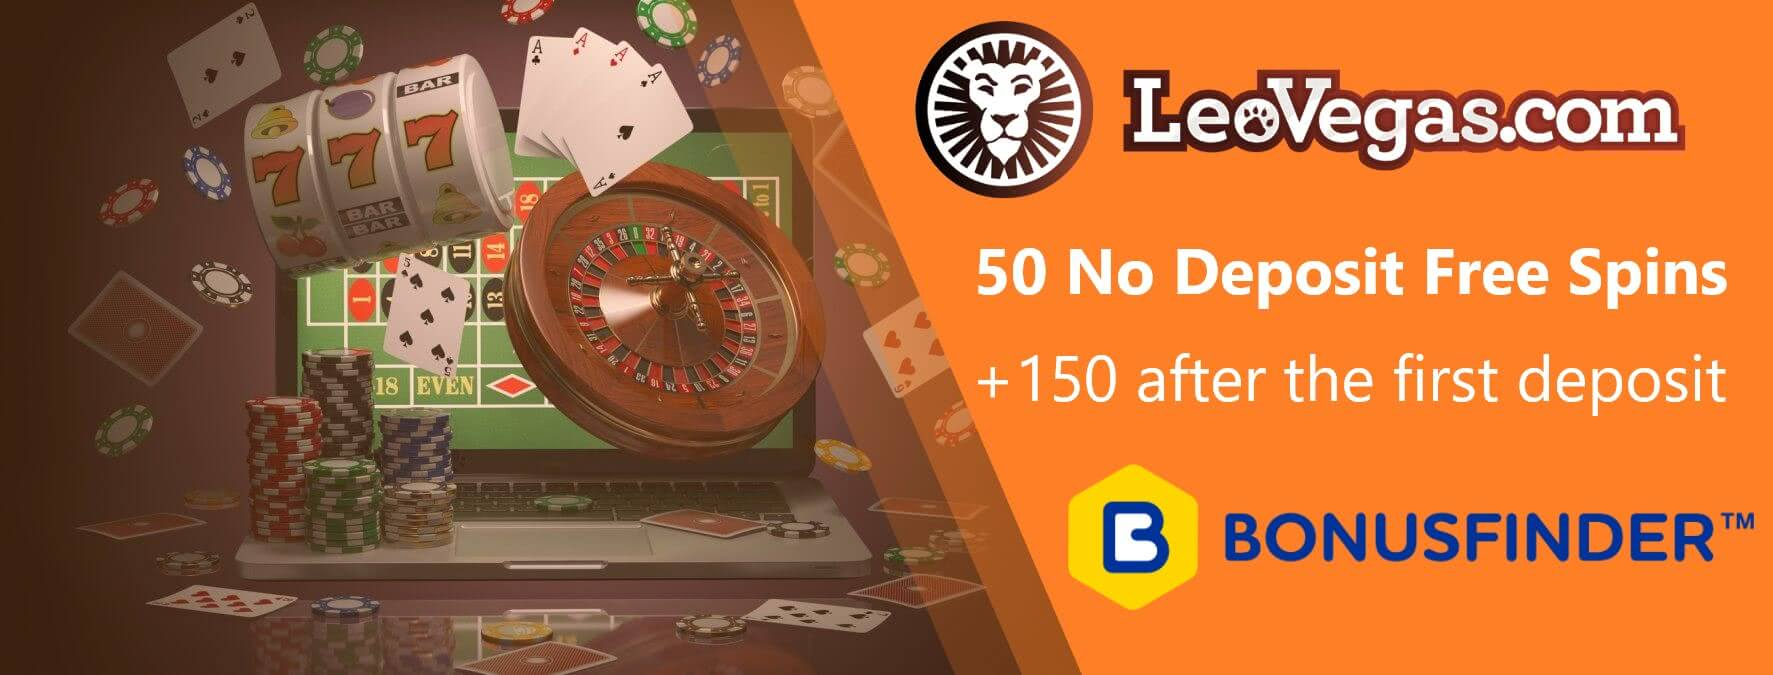 leovegas no deposit free spins bonus